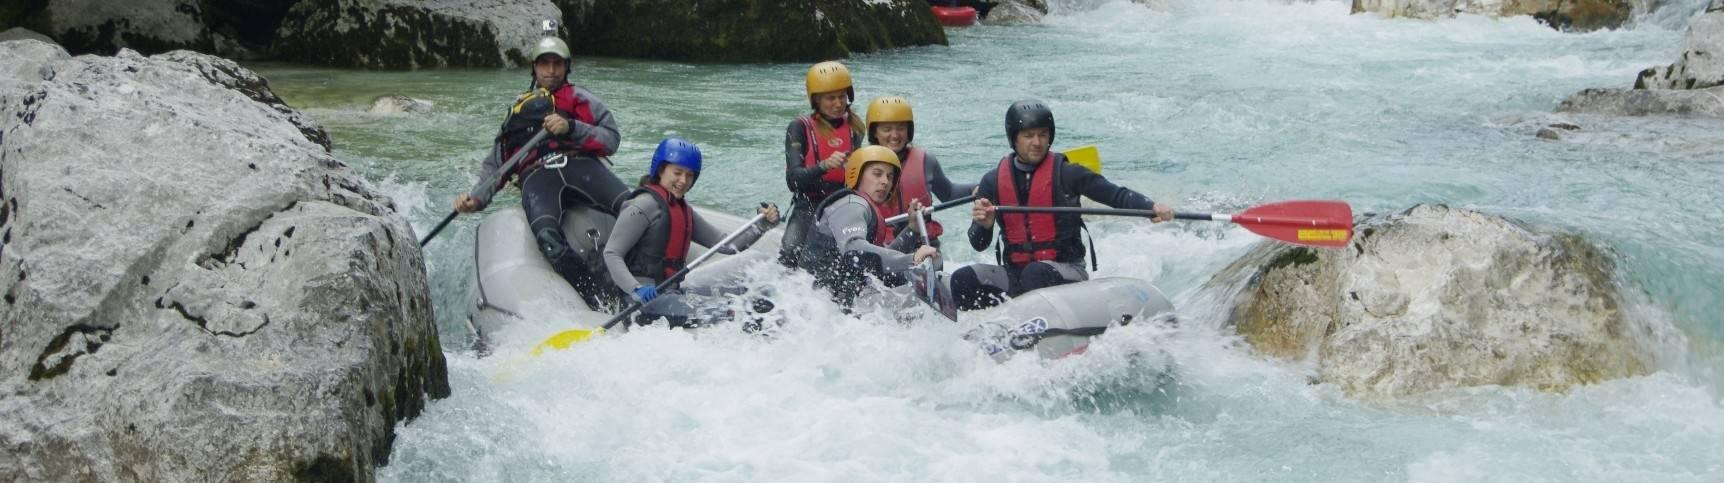 Rafting túra a Soca folyón